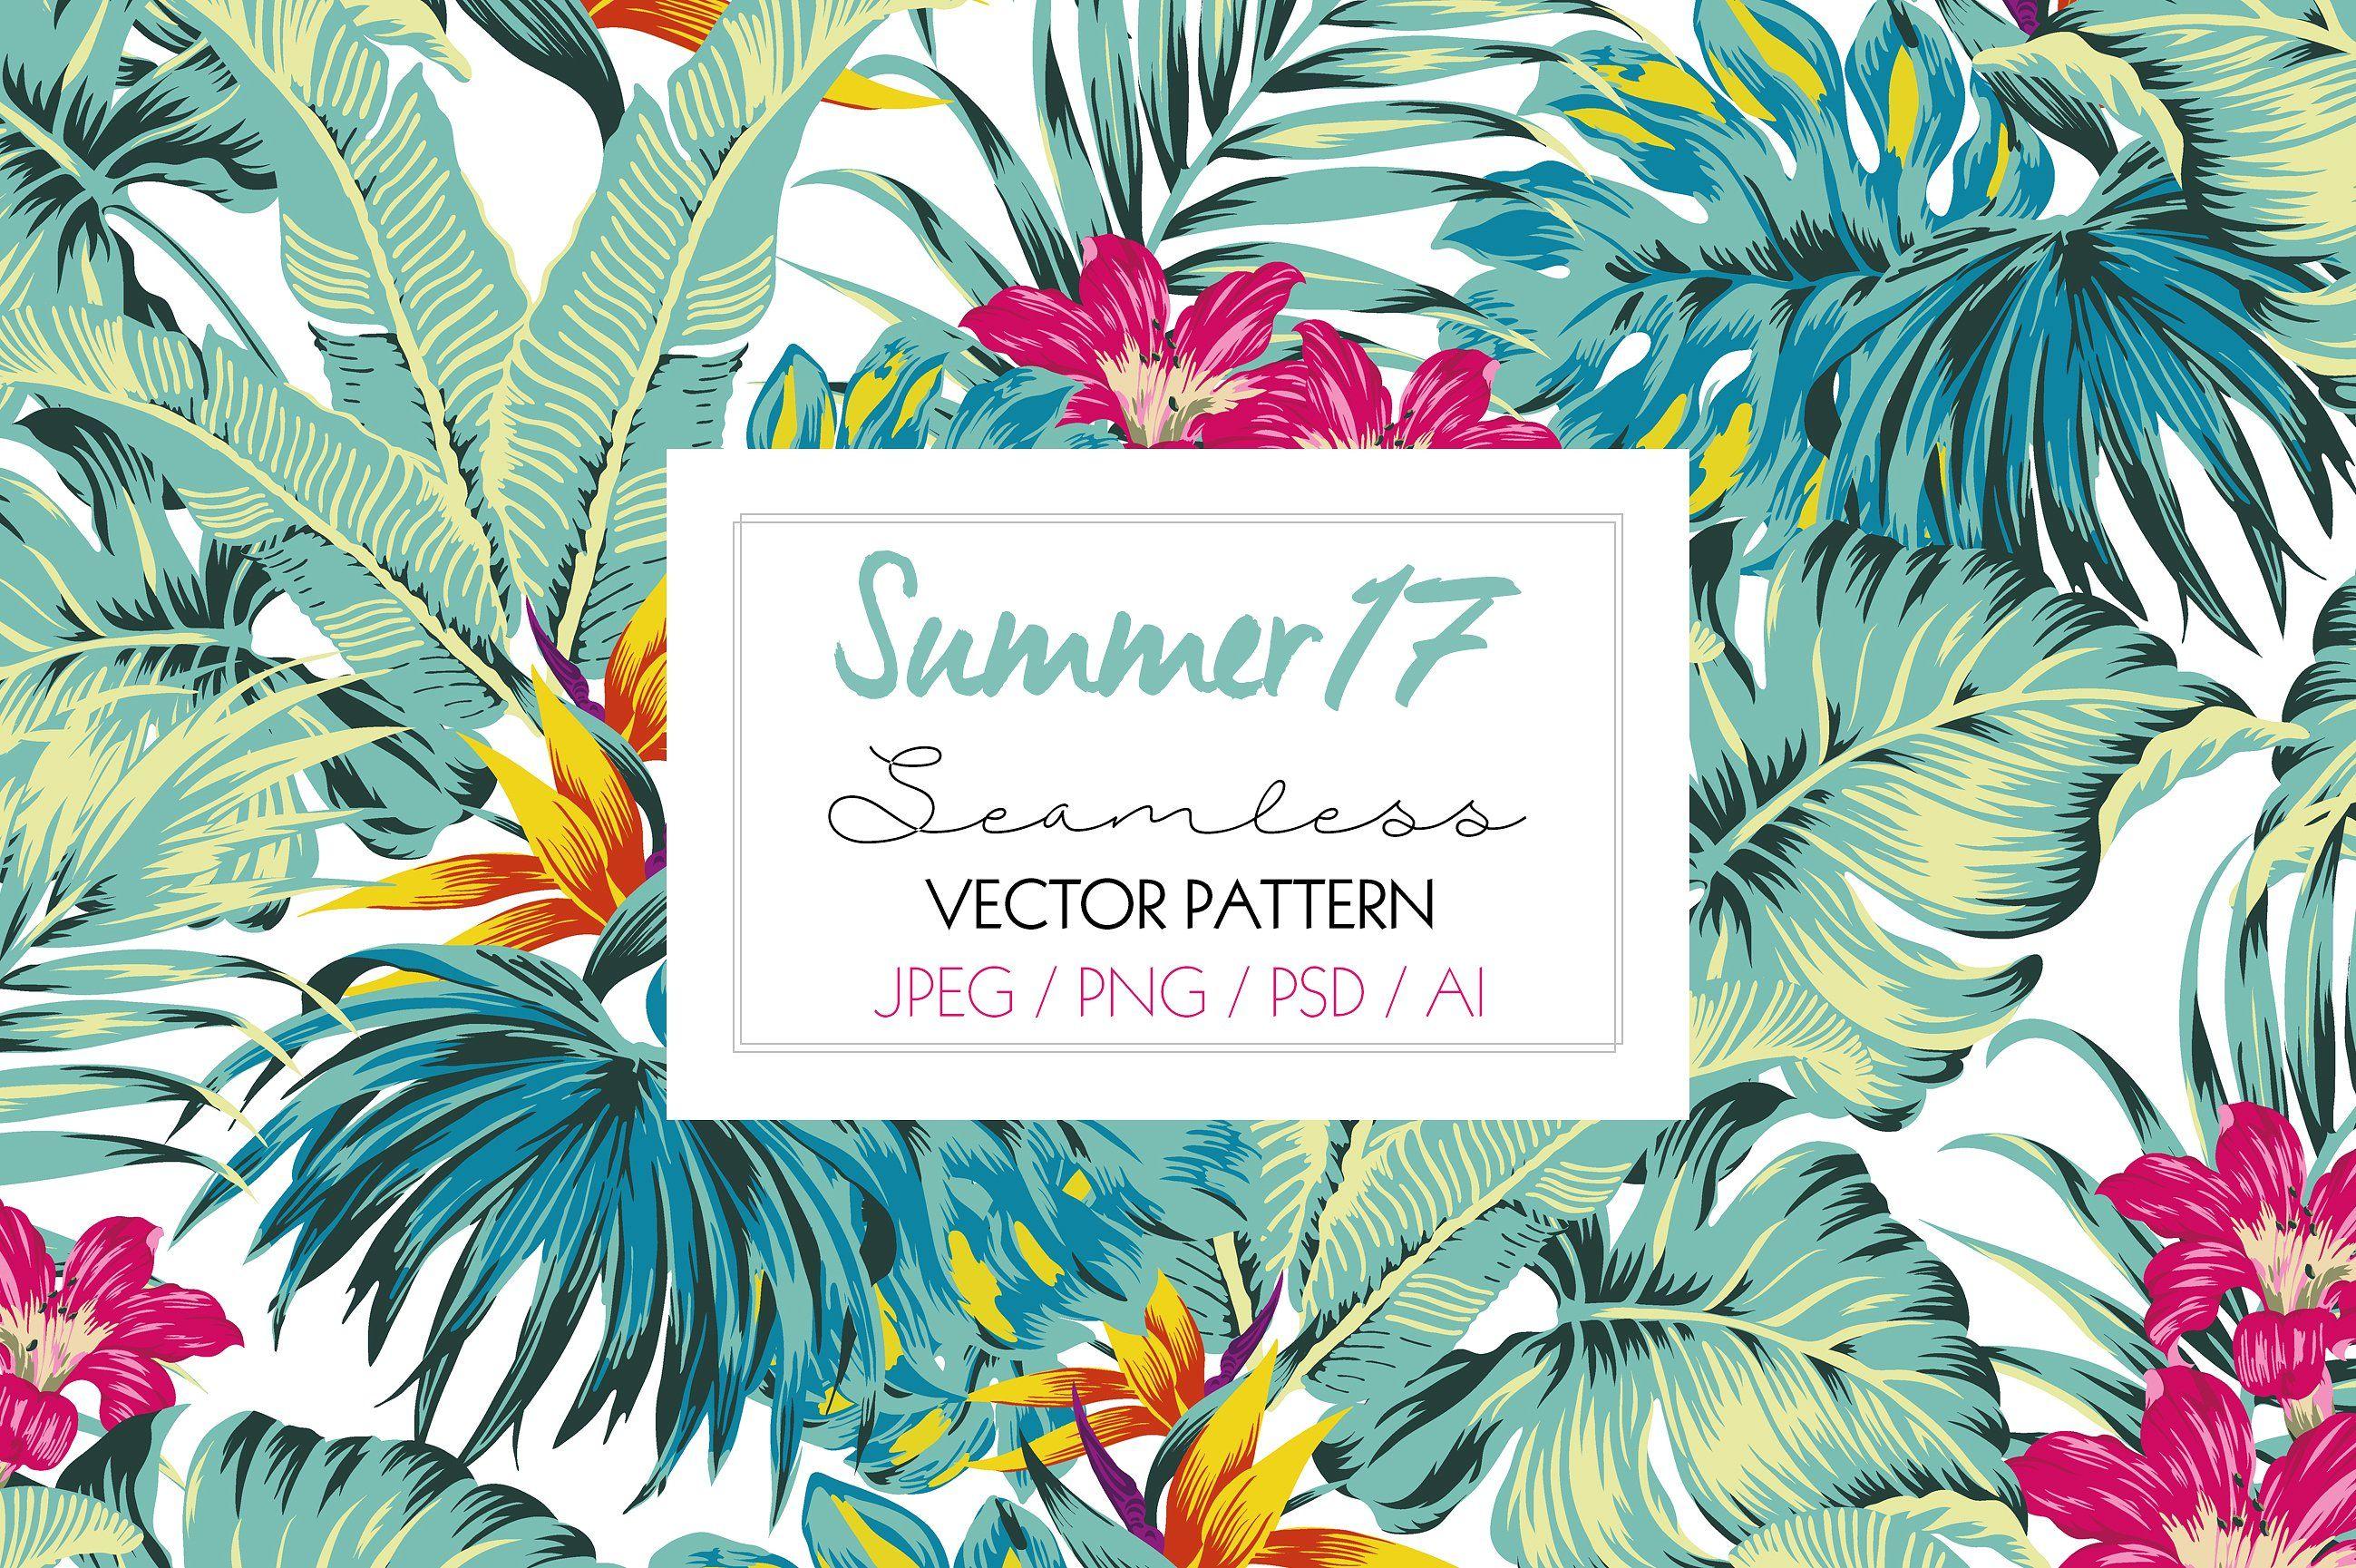 TROPICAL SUMMER PRINT  Summer prints, Prints, Graphic patterns